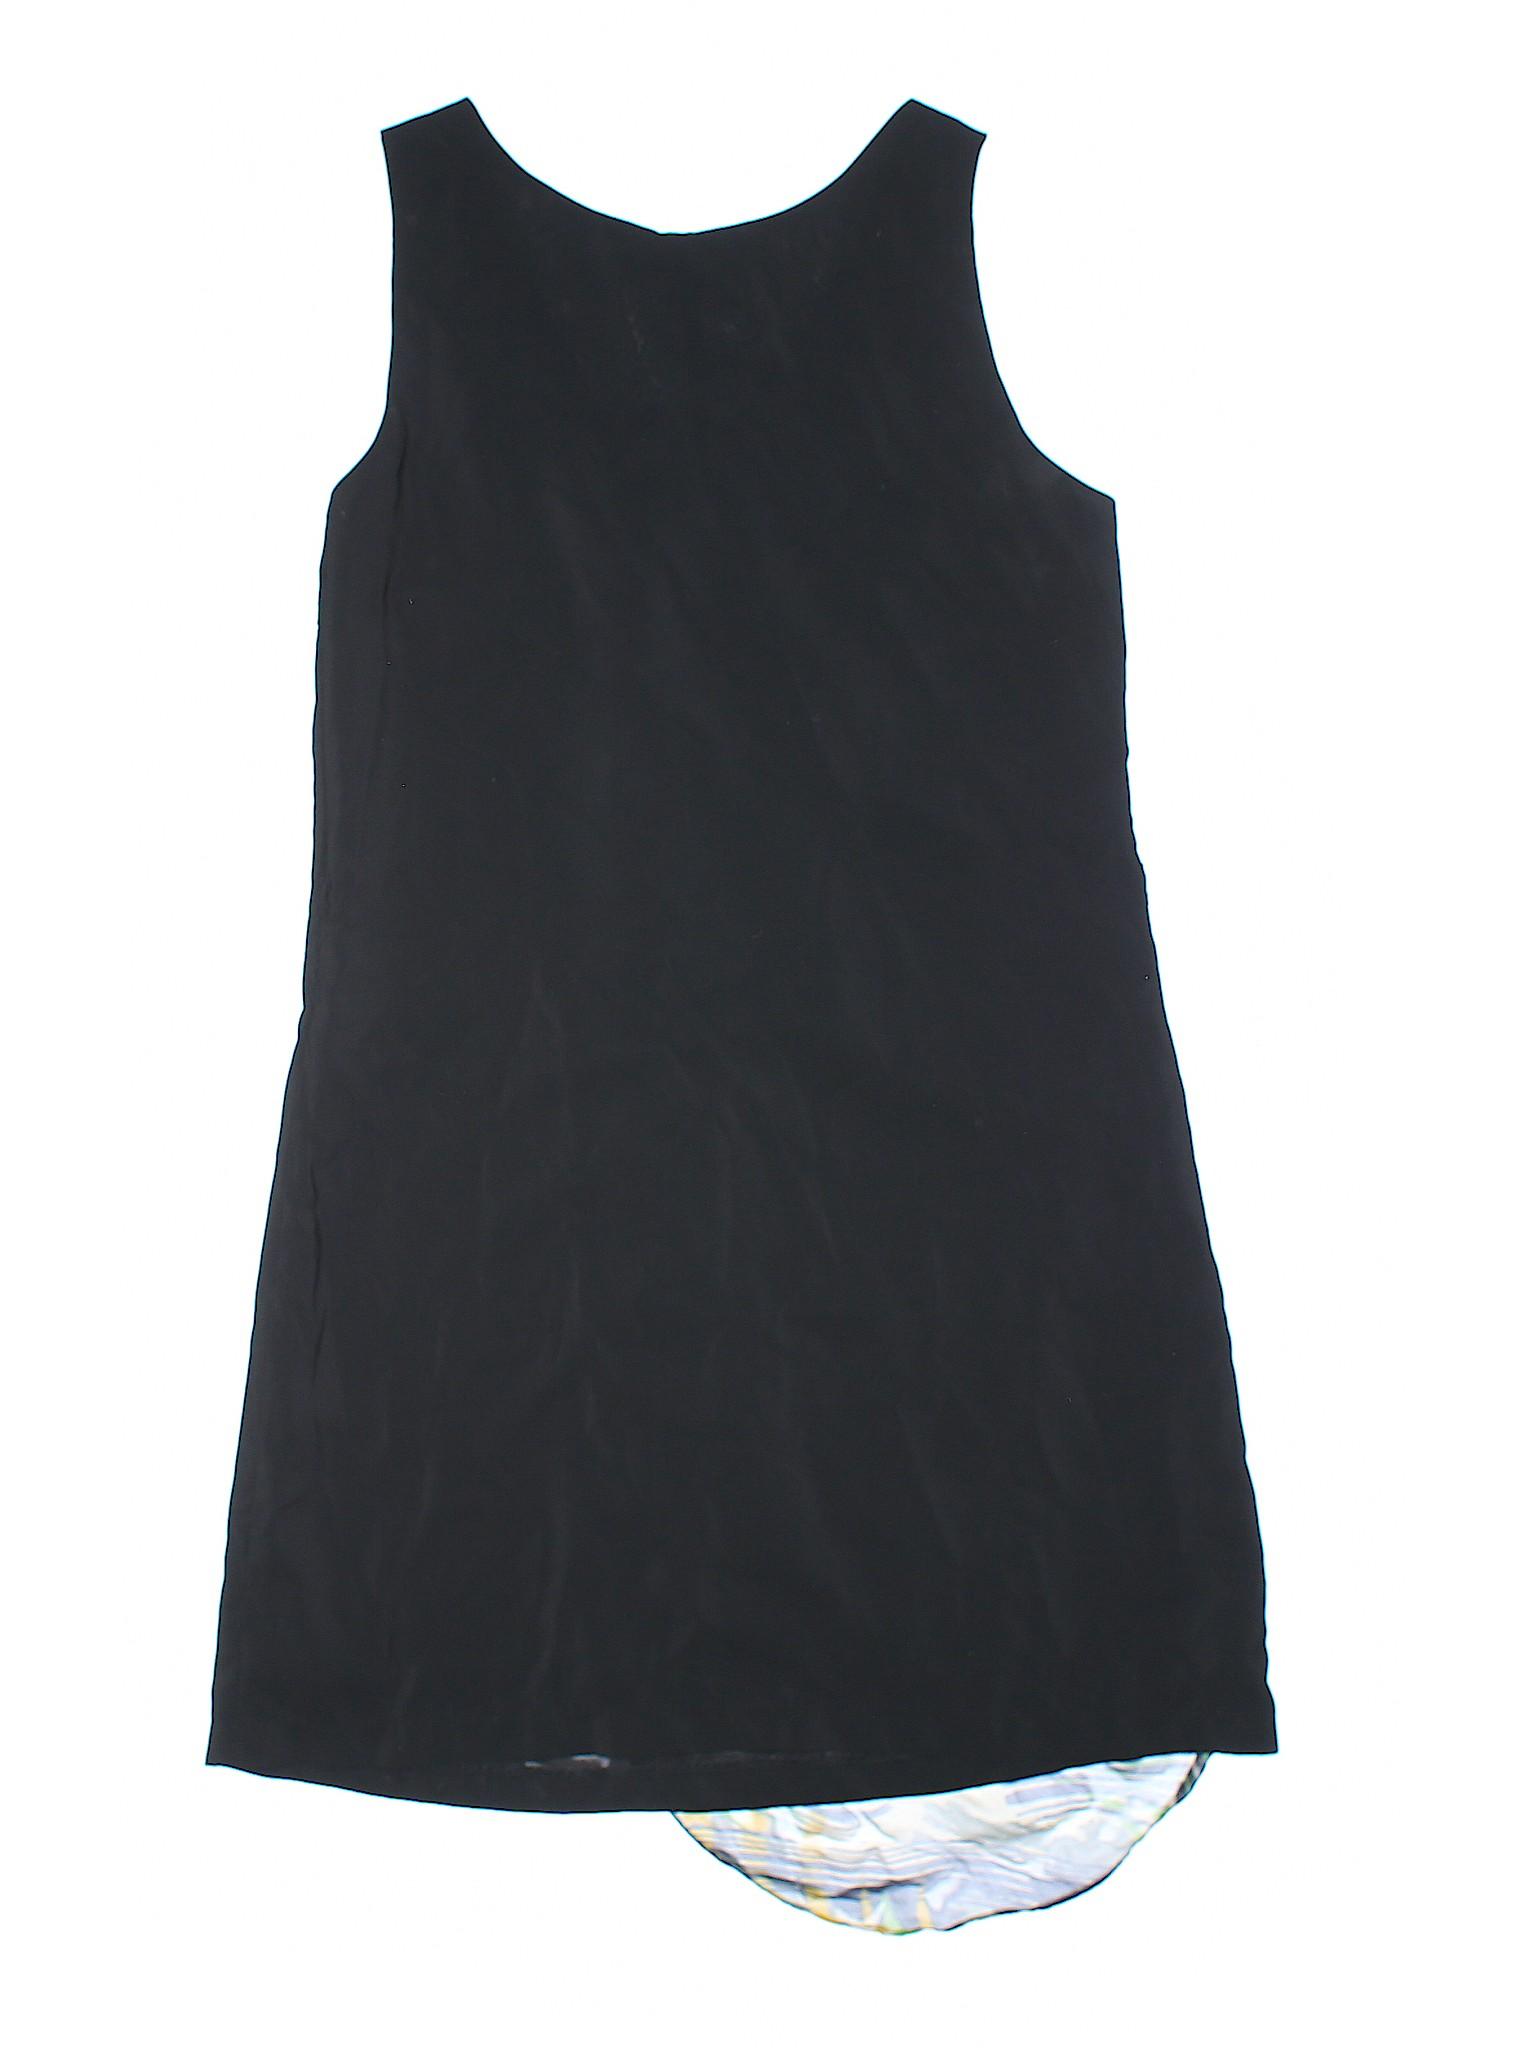 Boutique 21 Love winter Dress Casual Rxw0p1wq7